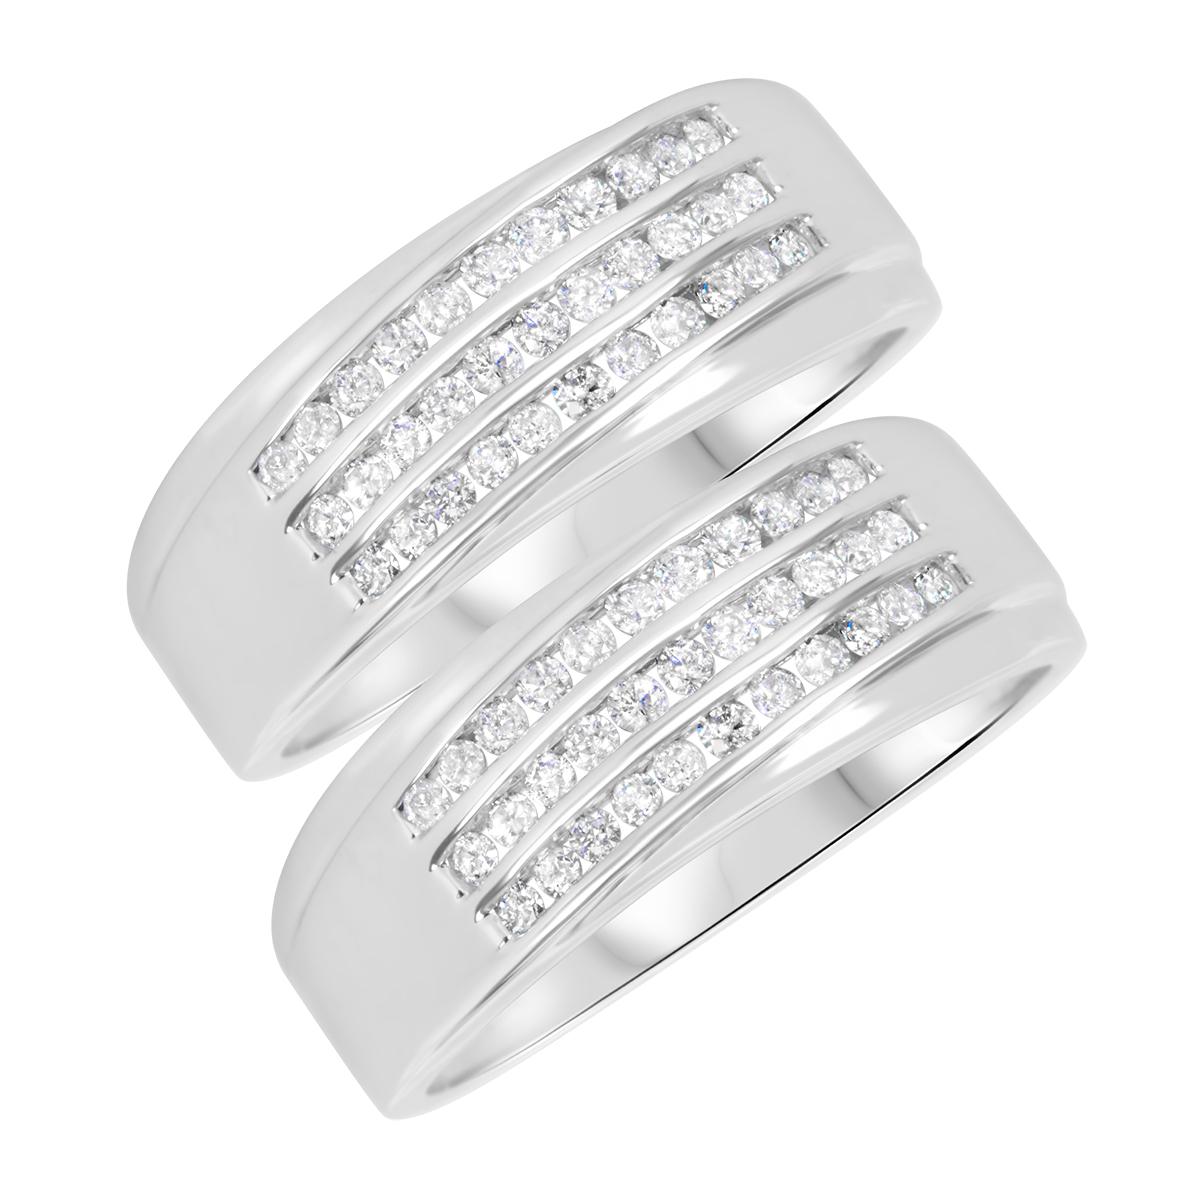 7/8 Carat T.W. Round Cut Mens  Same Sex Wedding Band Set 10K White Gold- Size 8